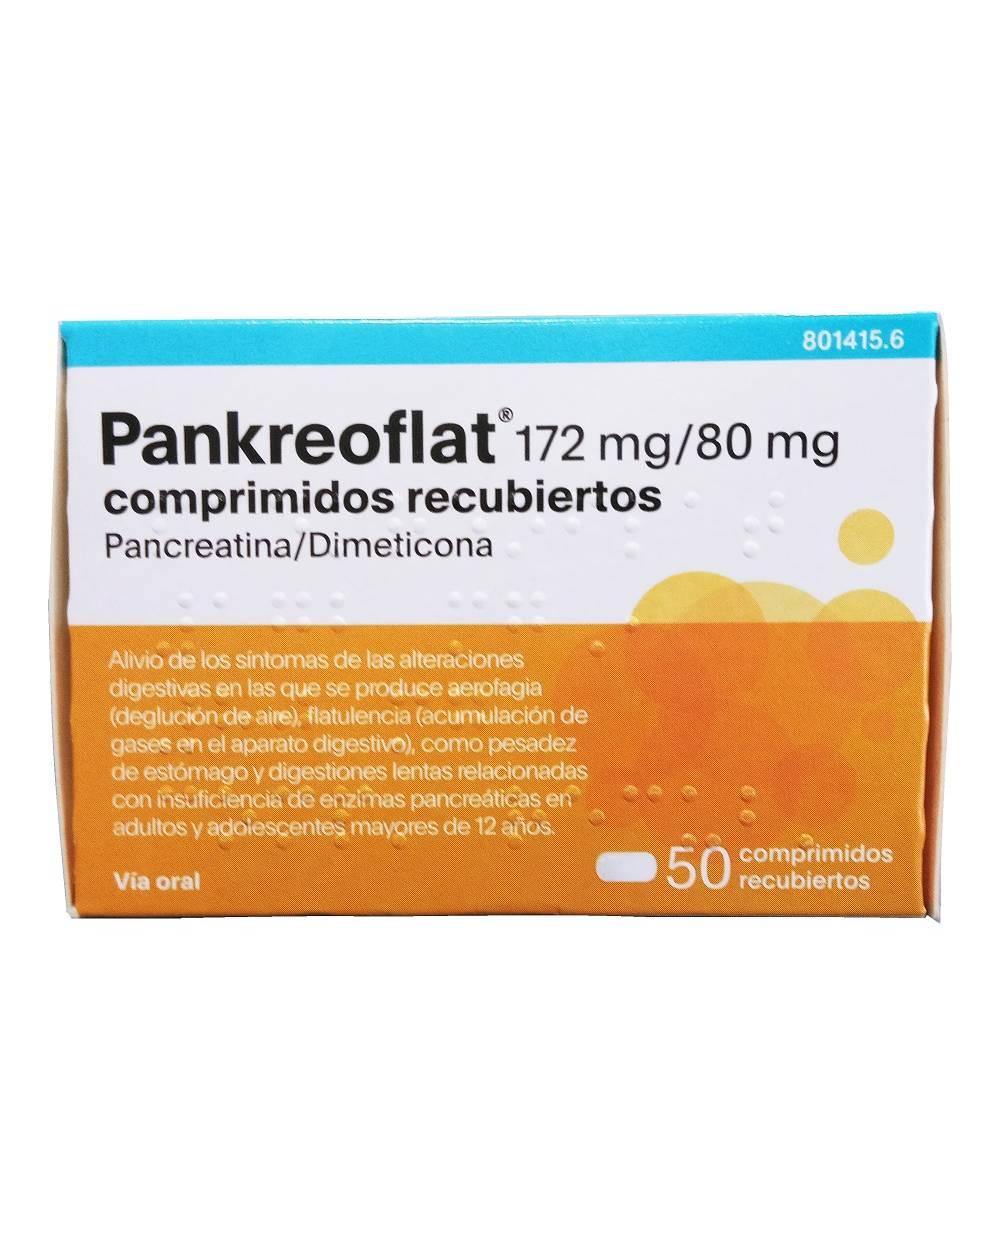 Pankreoflat - 50 comprimidos